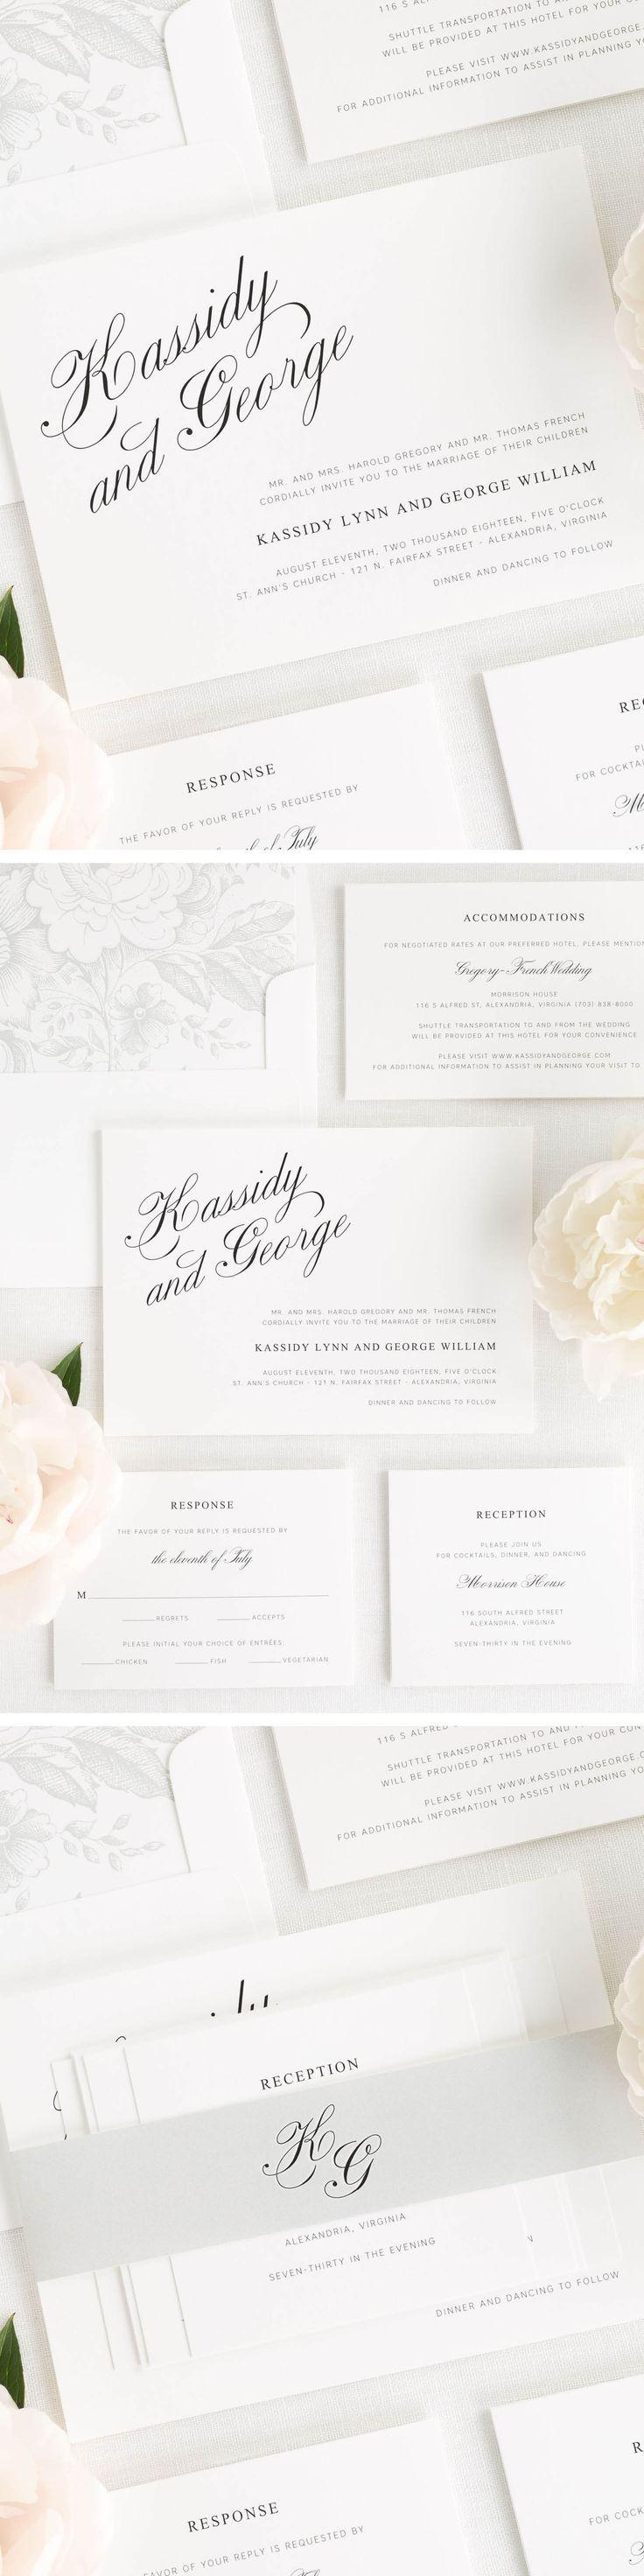 794 best Wedding Invitations + Wedding Stationary images on ...